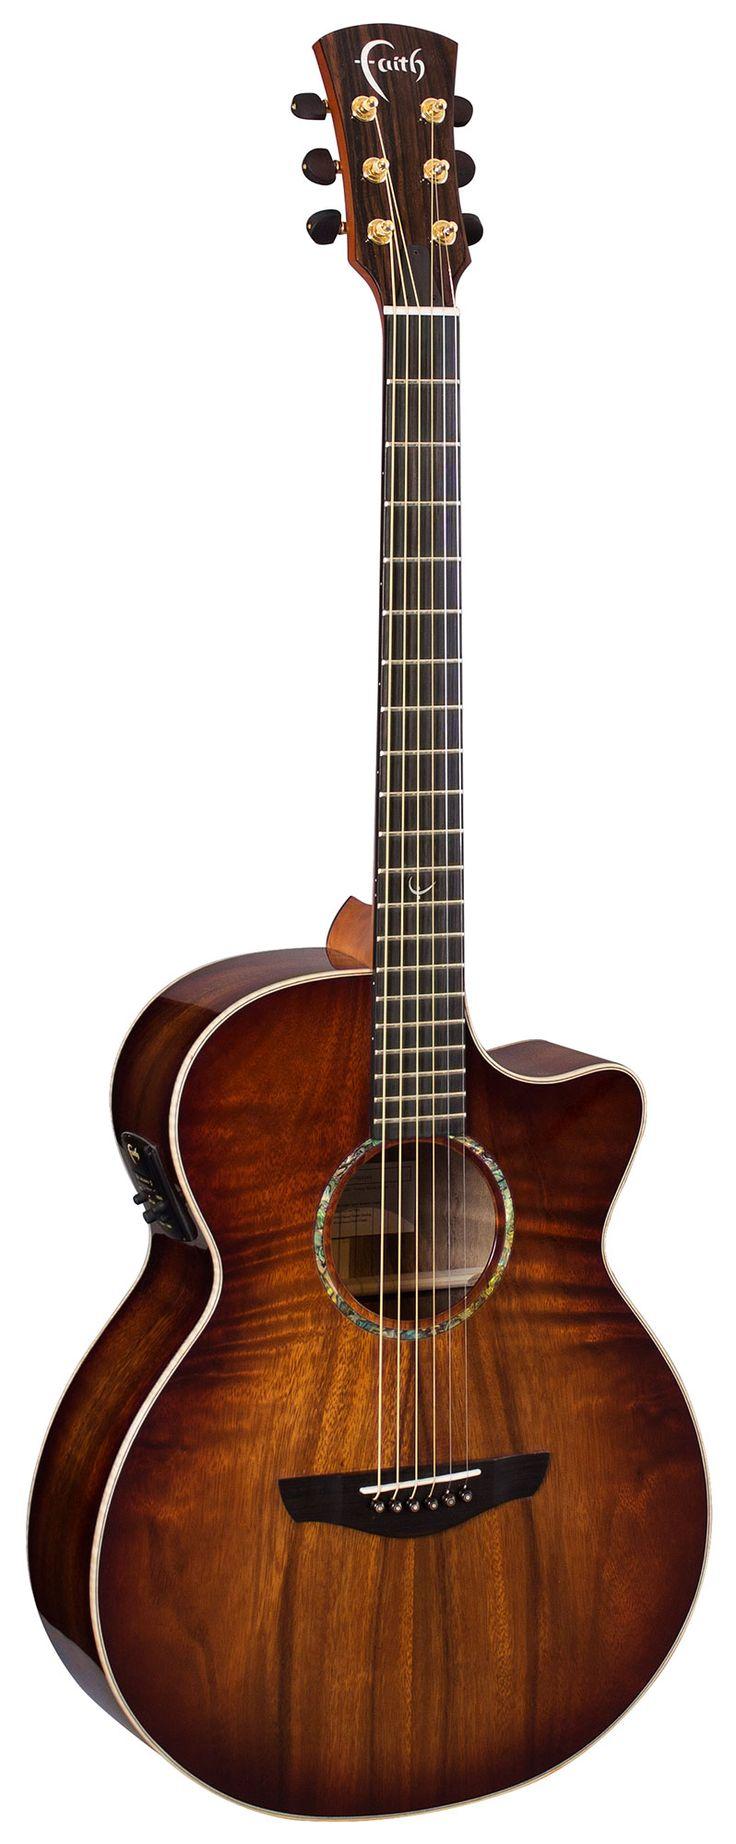 FVBMB - Venus Cut/Electro - Faith Guitars   Patrick James Eggle   Natural, Trembesi, Hi-Gloss, Eclipse series acoustic, electro acoustic, cutaway guitars   Barnes and Mullins Ltd